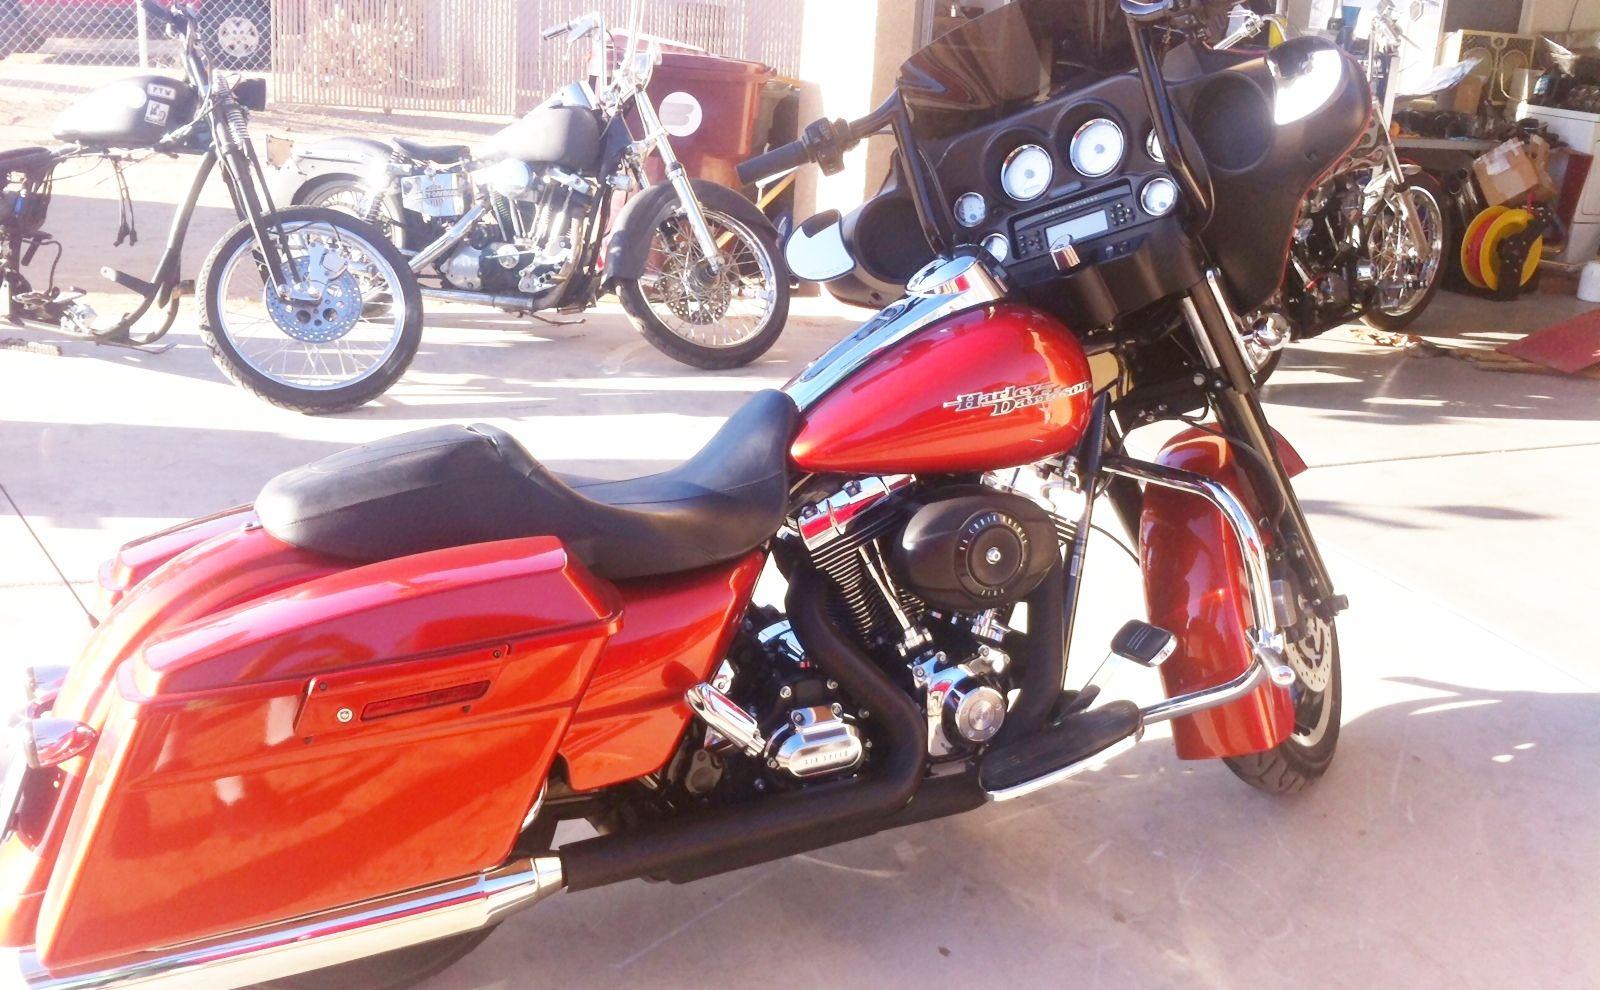 2011 Street Glide With Paul Yaffe 12 Monkey Bars Street Glide Harley Davidson Harley